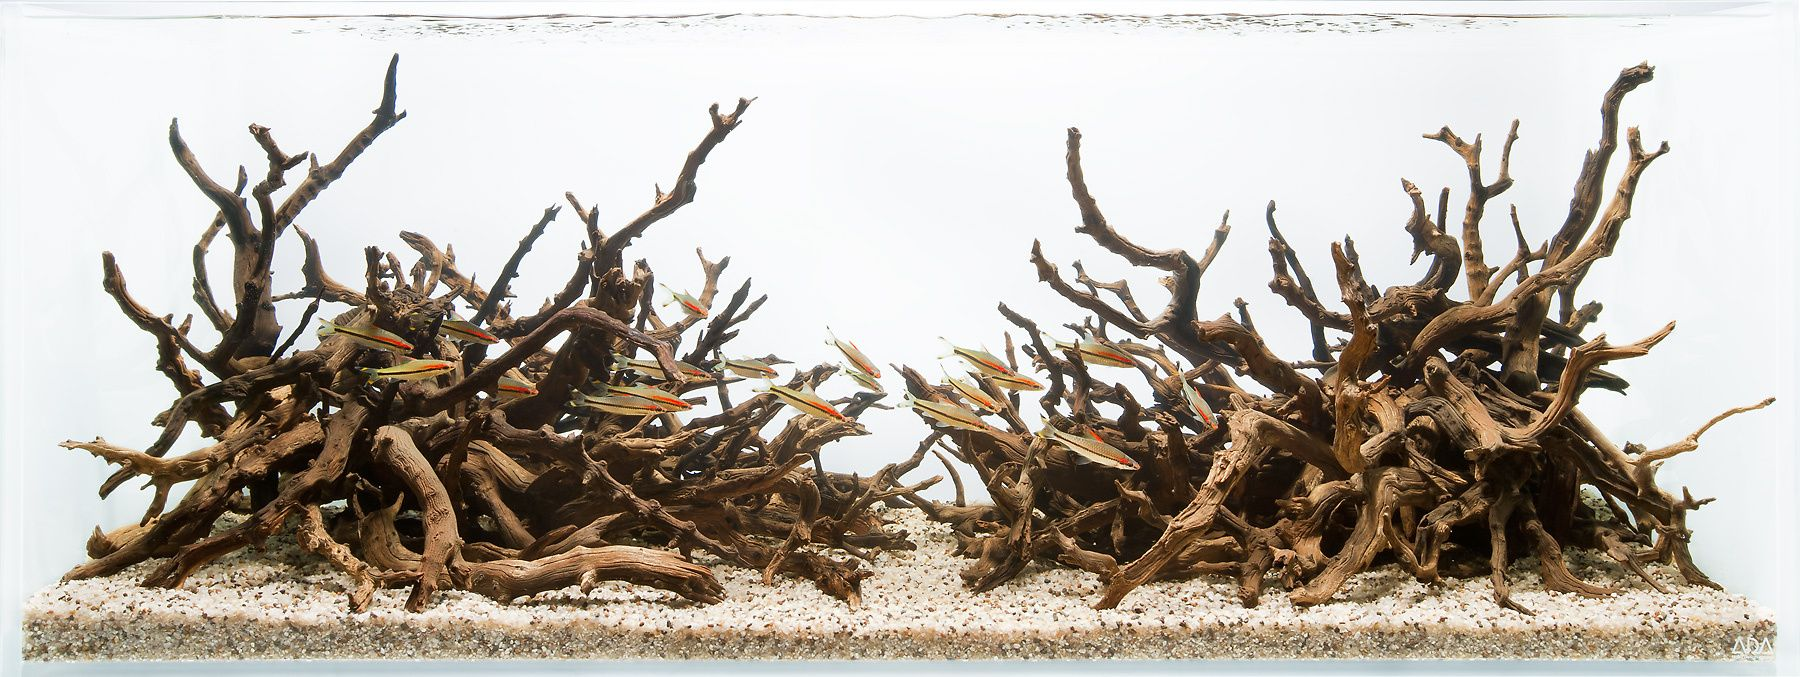 Tanglerose- A Hardscape for Roseline Sharks